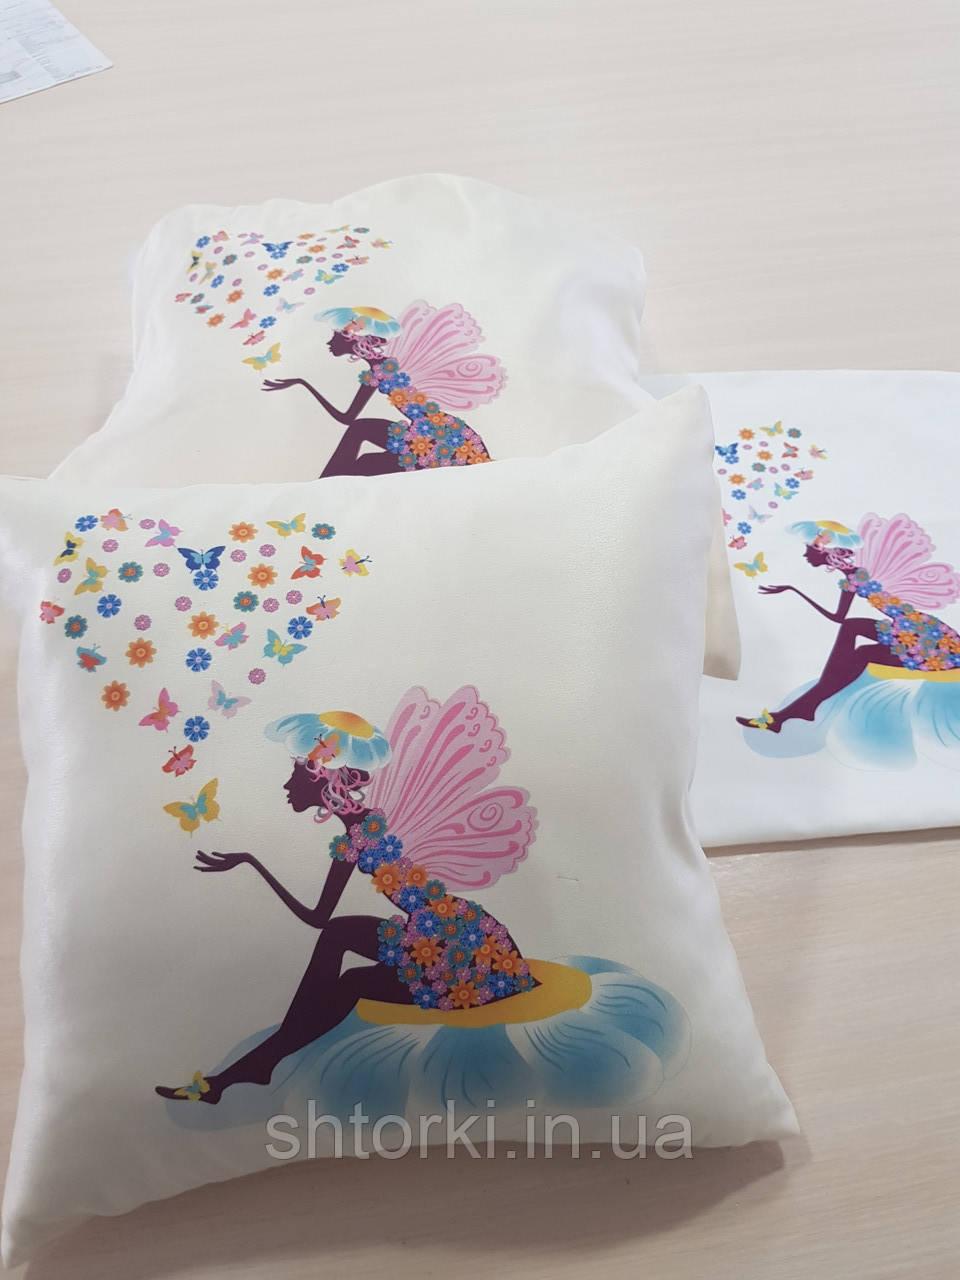 Подушка   в подарок Фея и бабочки, 40х40см